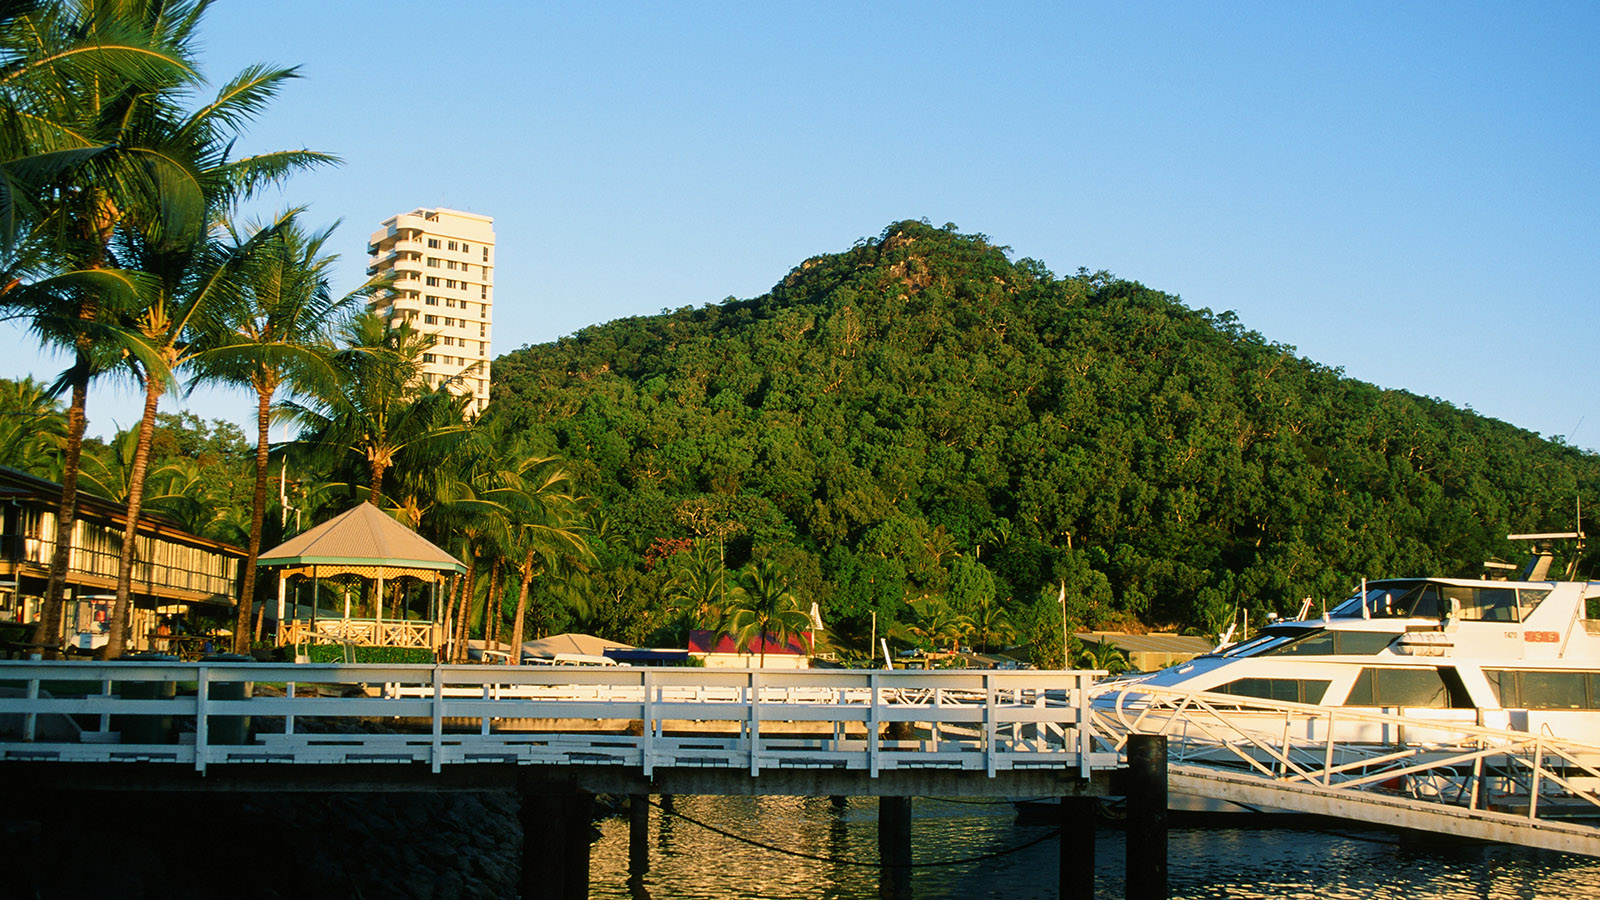 Hamilton Island: Marina mit Hotelturm. Foto: Hilke Maunder